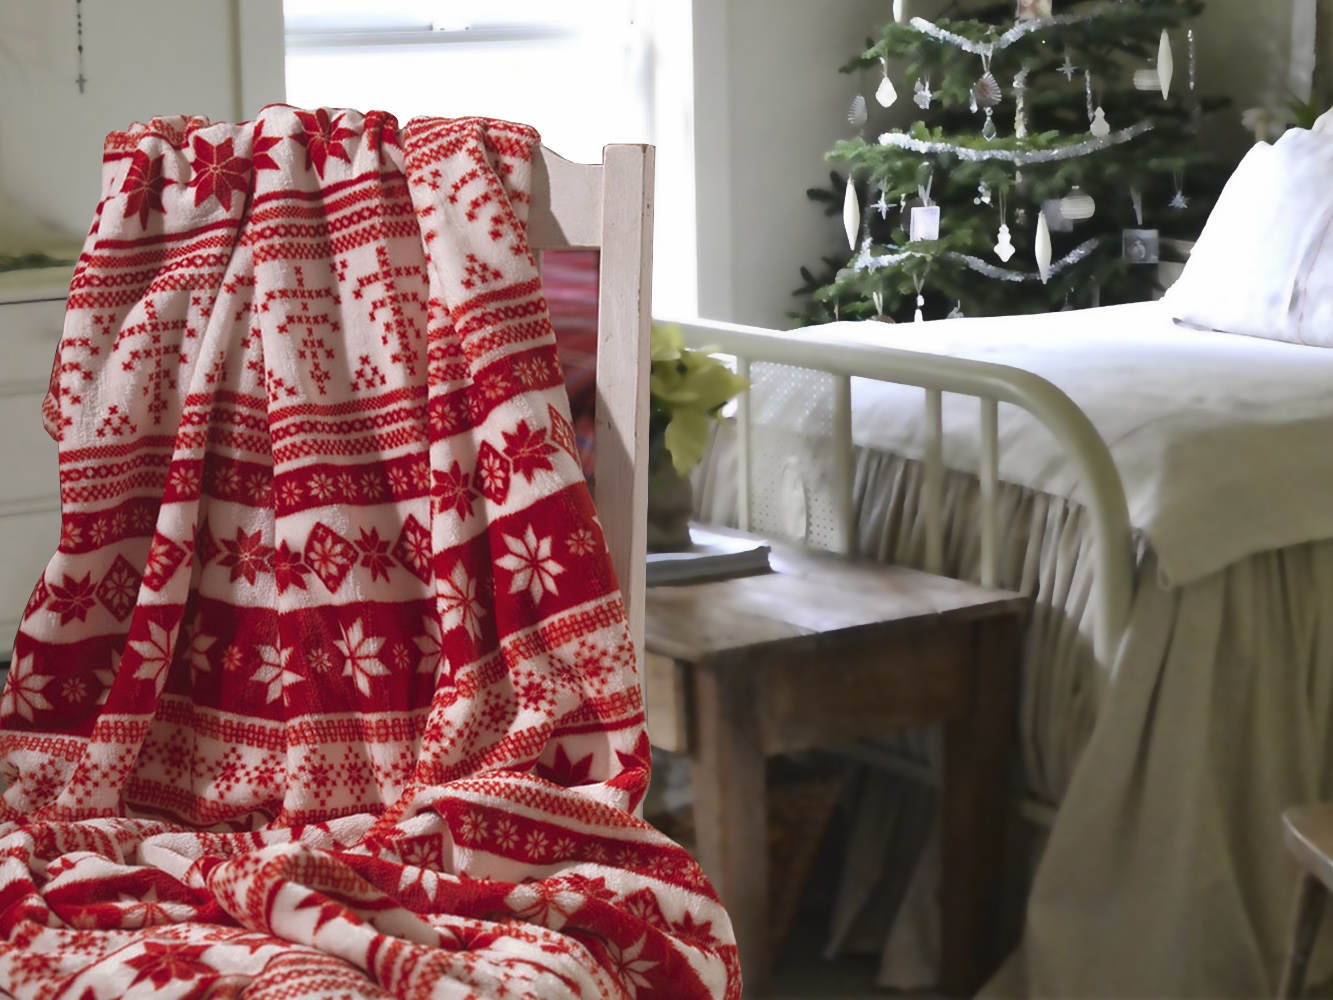 Christmas Throw Blanket.Details About Premium Festive Super Soft Plush Fleece Christmas Throw Blanket 180cm X 130cm